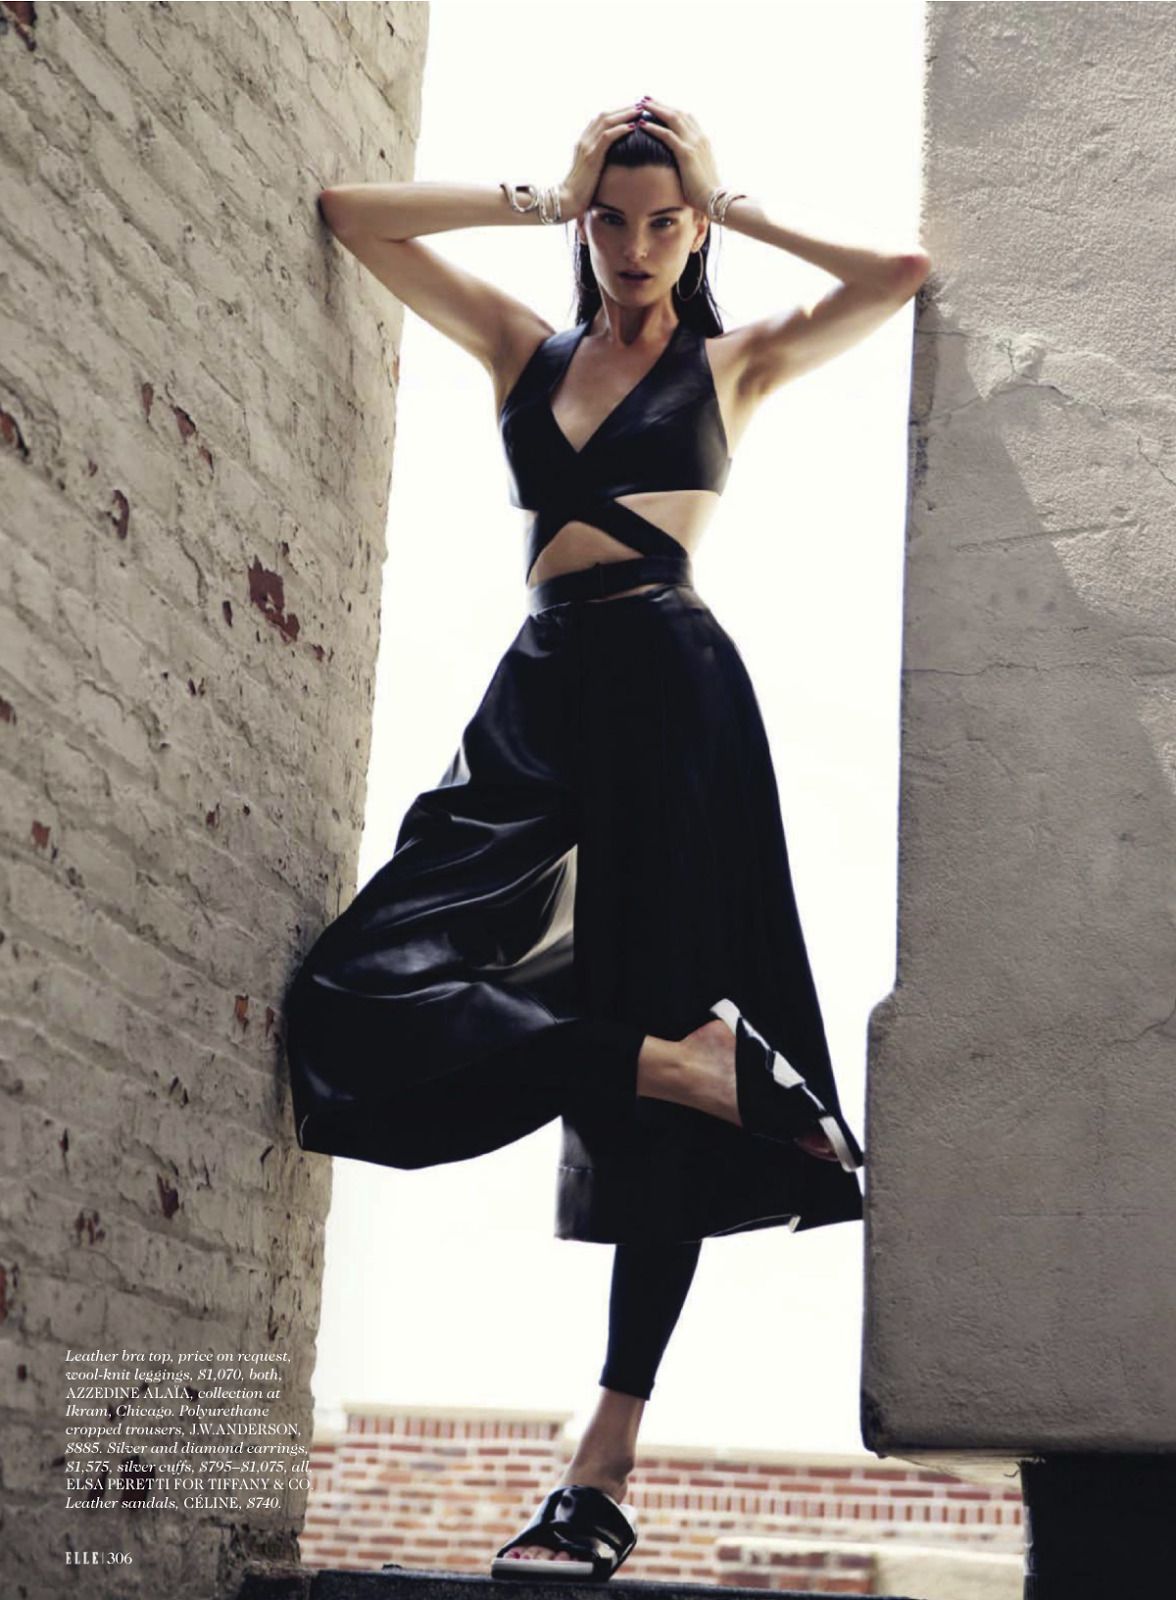 Azzedine Alaia Wrap Leather Cutout Black Top - image 3